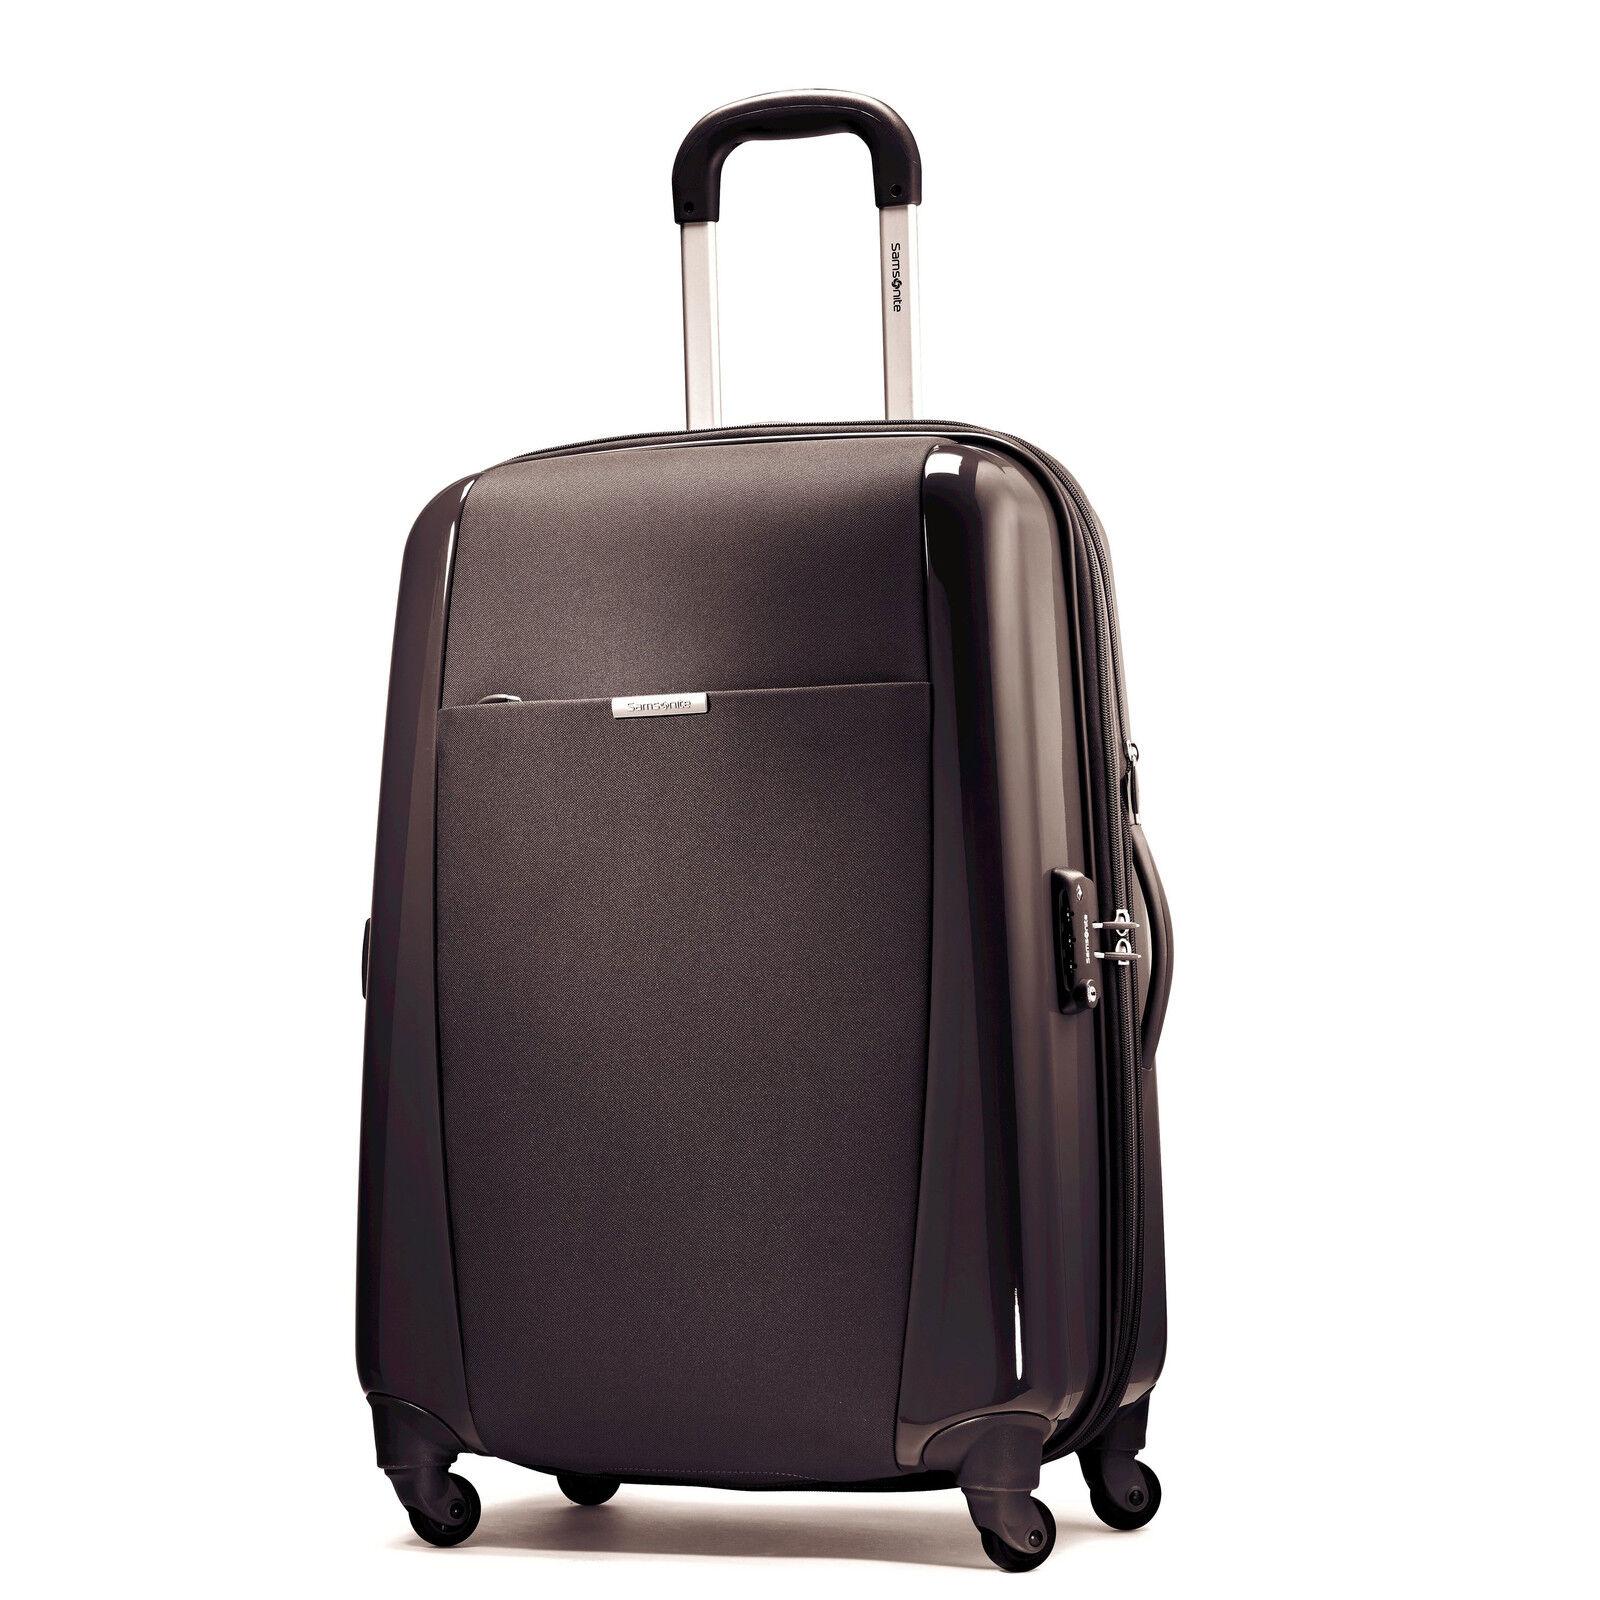 Cross-border:-Samsonite Sahora Brights Spinner Luggage, 28″ low price